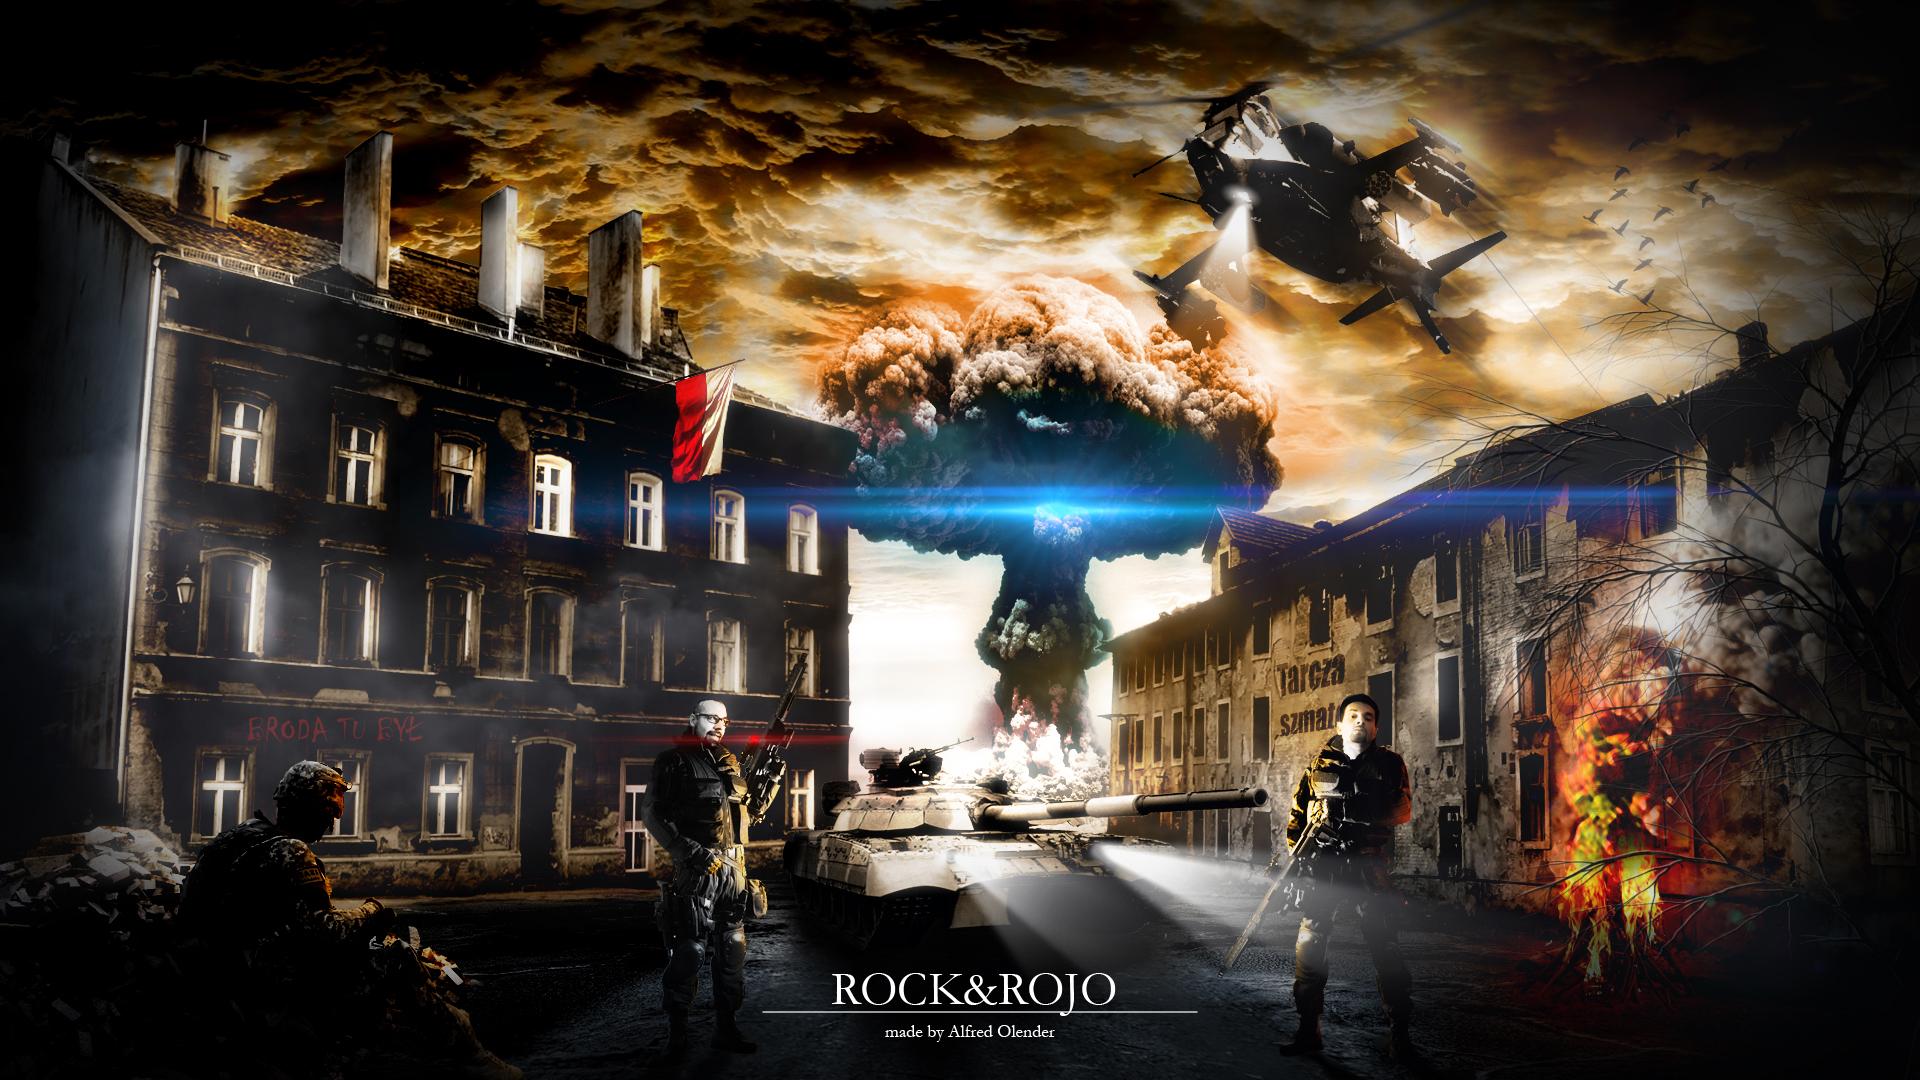 Rock&Rojo by Alfred Olender